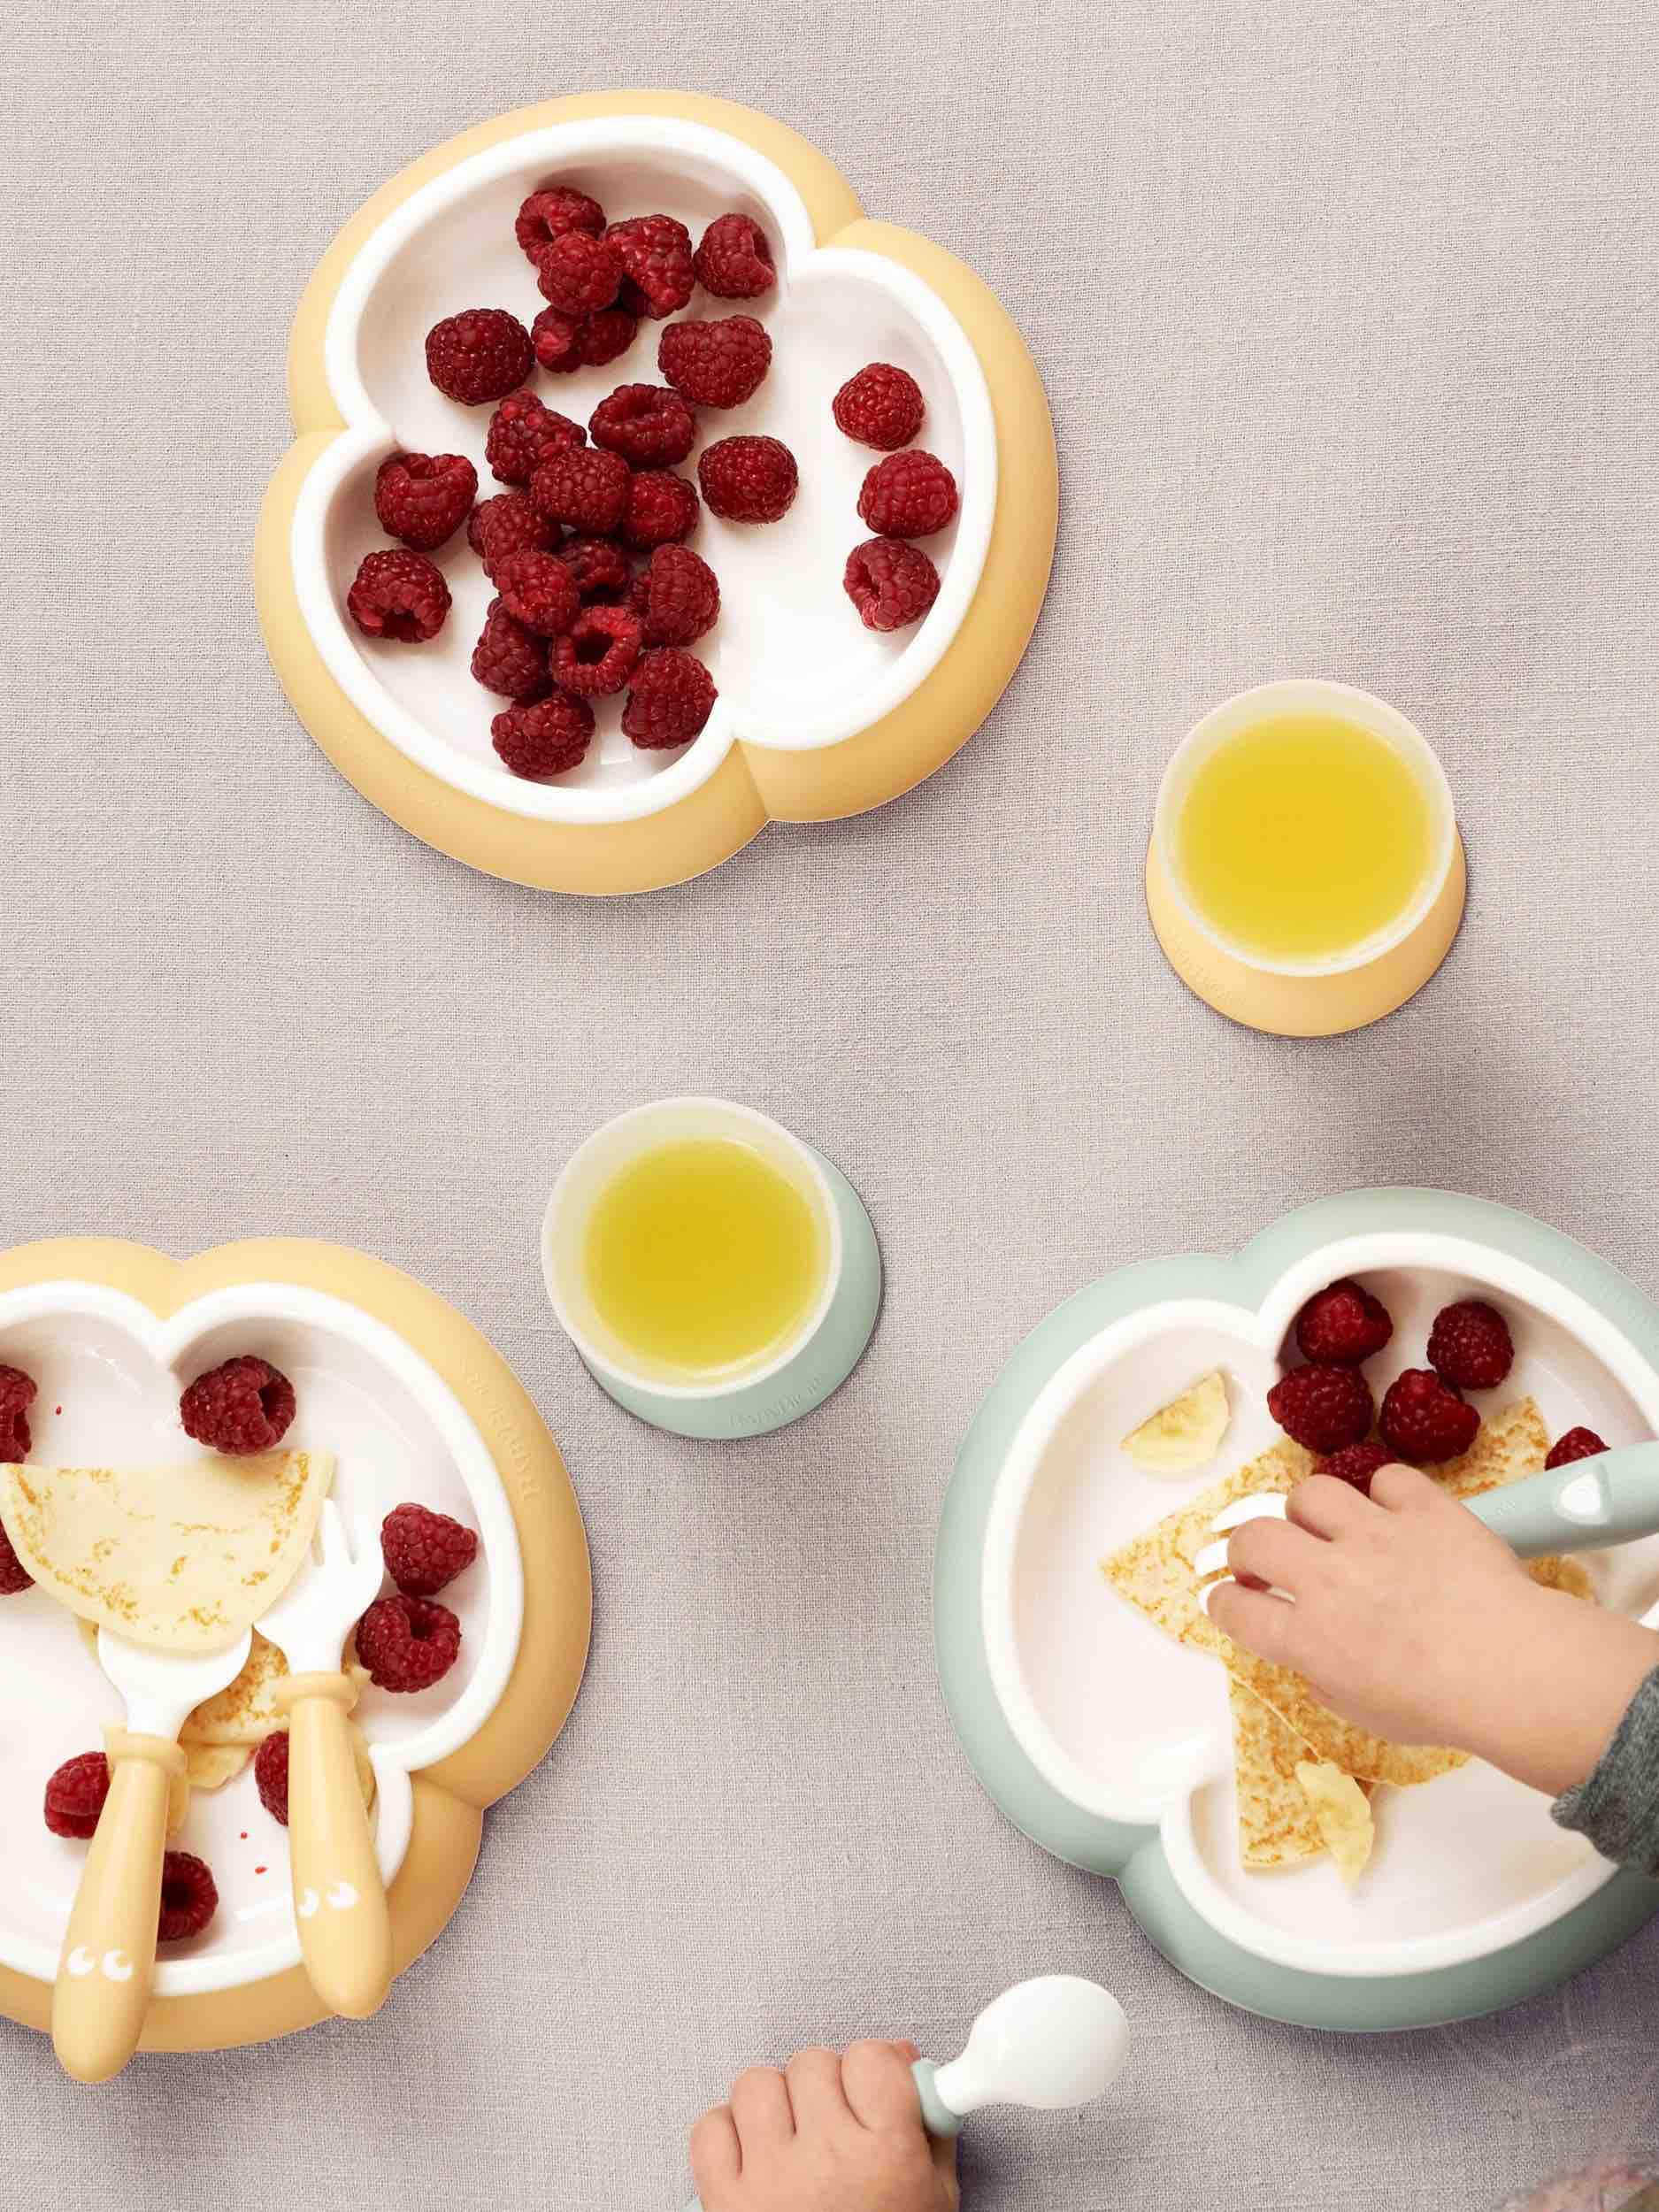 babybjorn-набор посуды-желтый